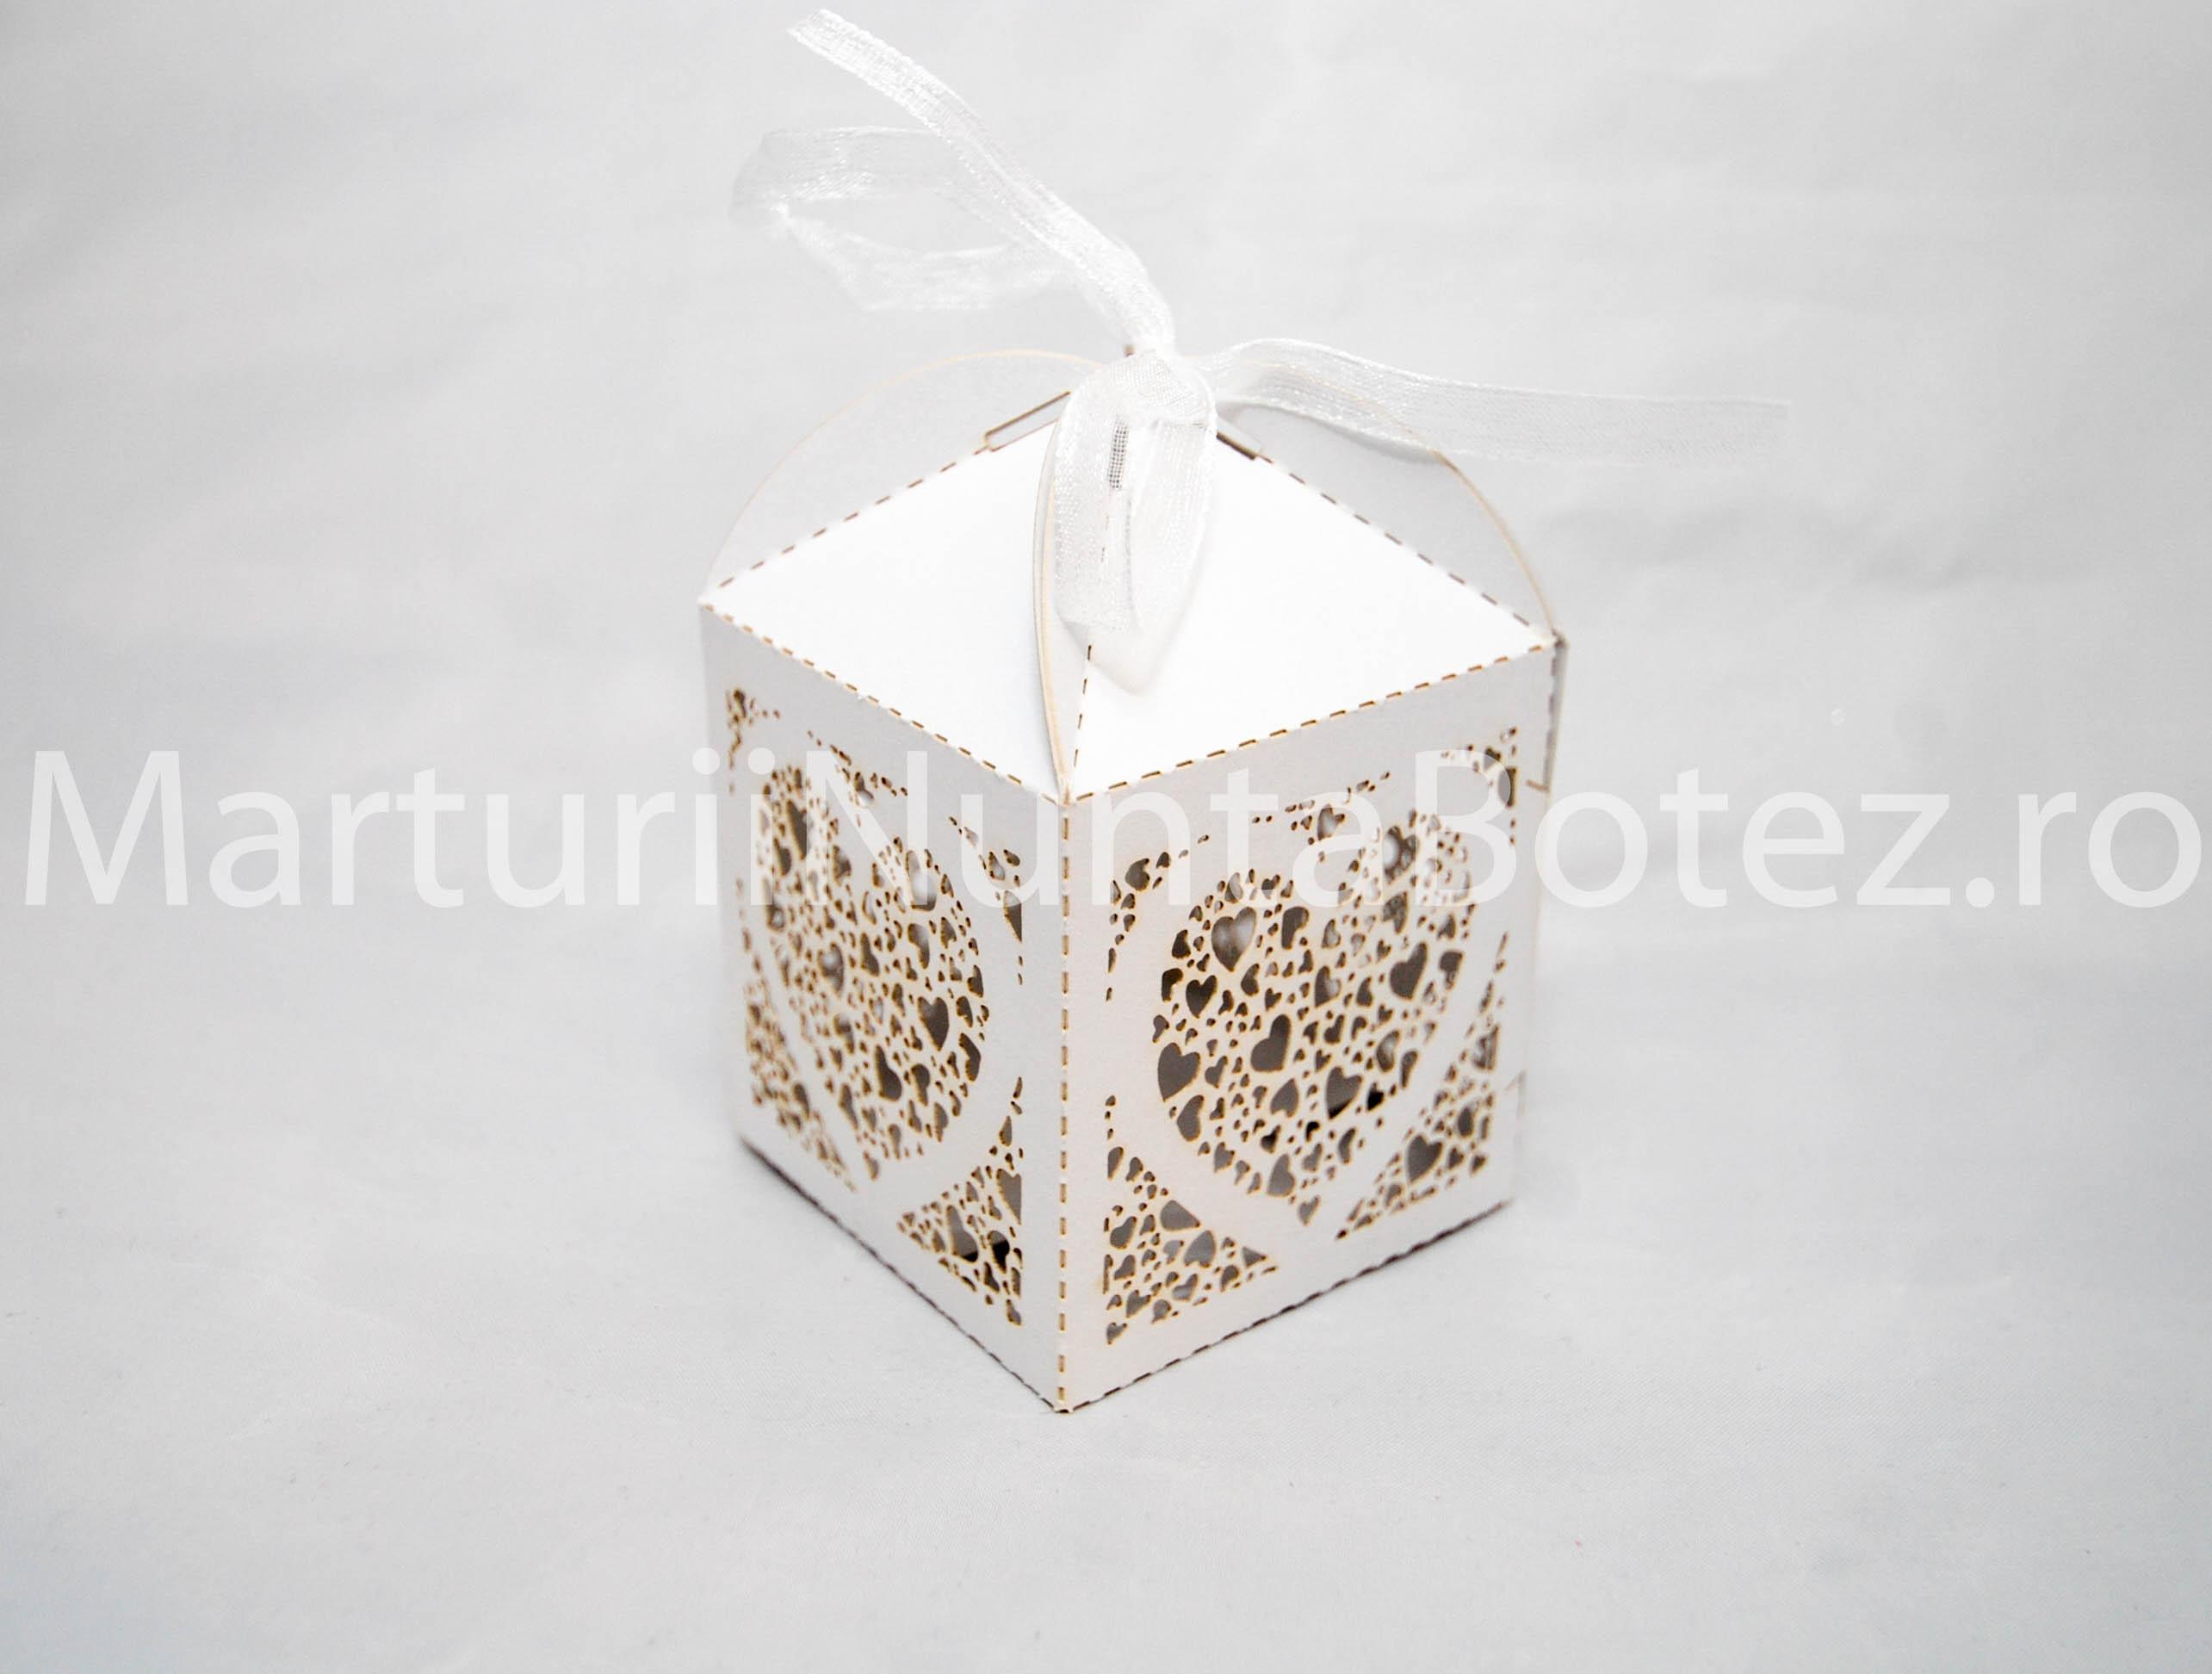 marturii_nunta_cutie_perforata_carton_model_inima_deosebita3